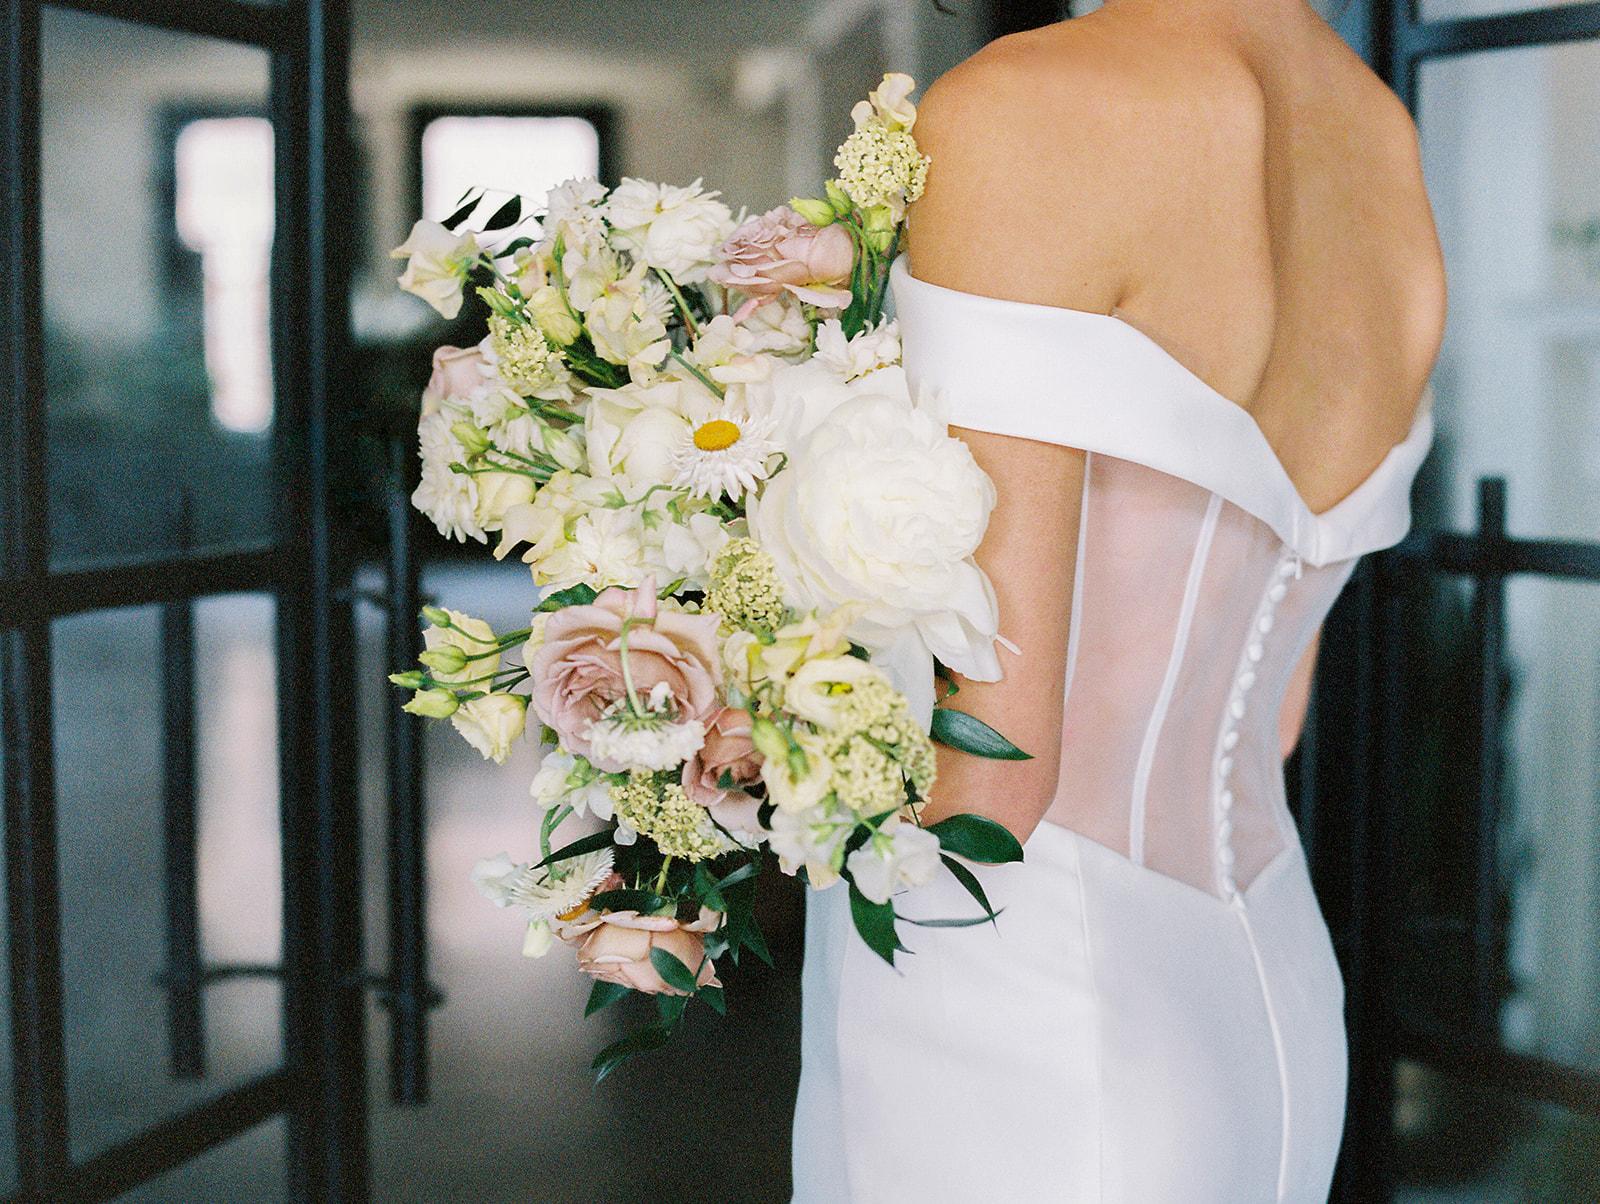 Stanley Korshak Bridal Salon wedding dress